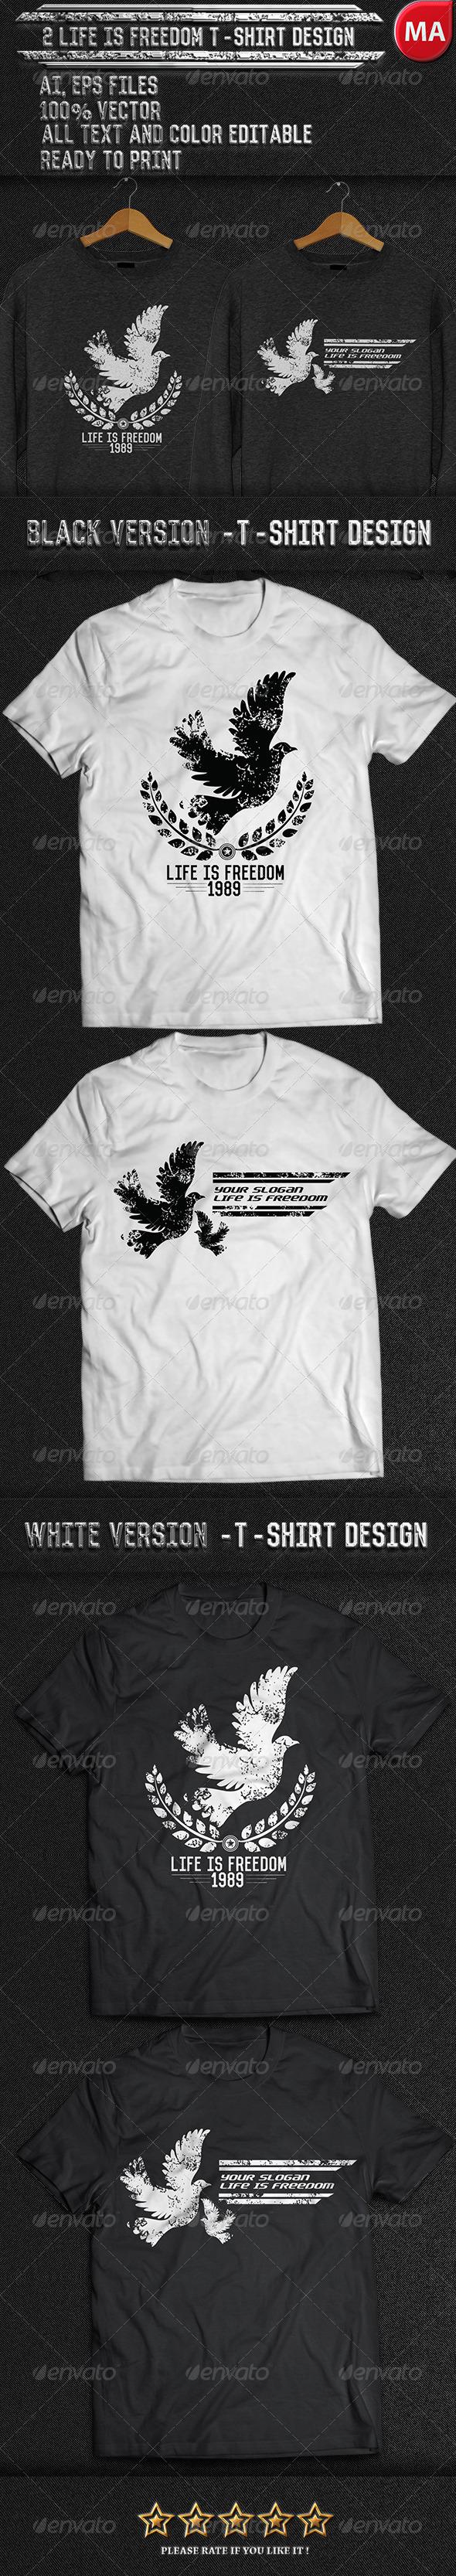 2 Life Freedom T-Shirt